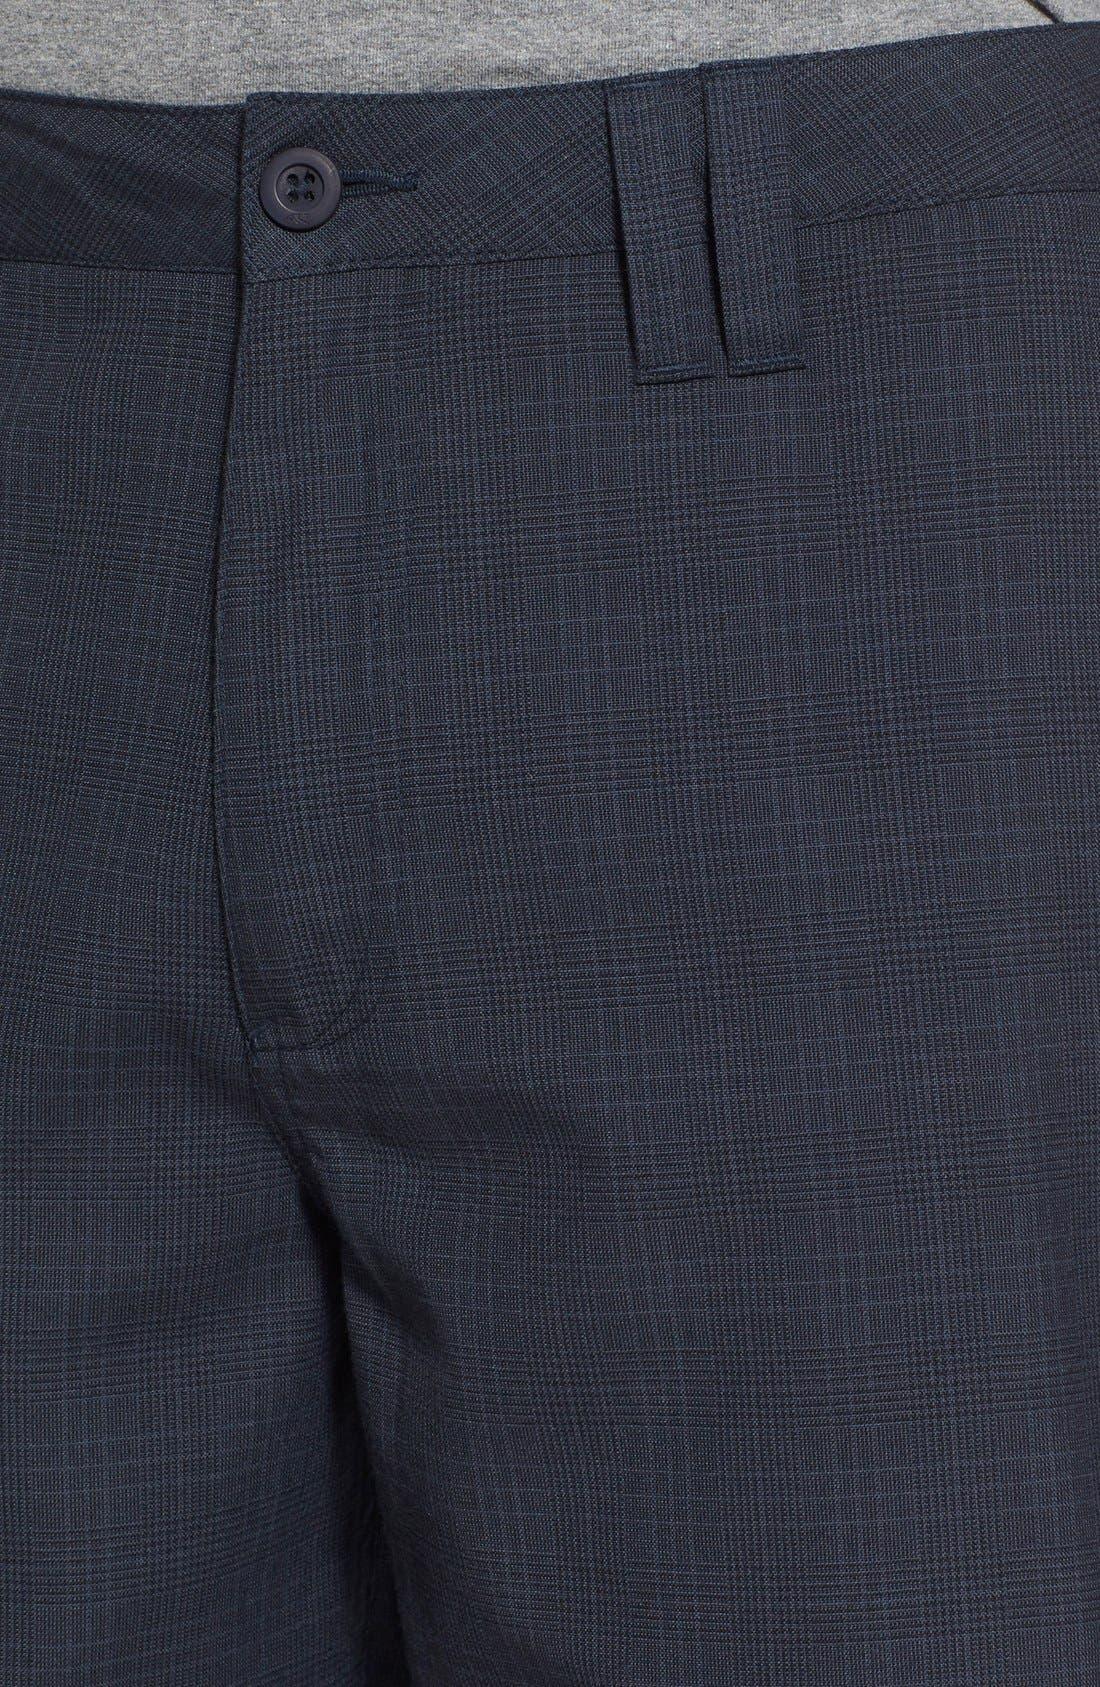 'Delta Plaid' Chino Shorts,                             Alternate thumbnail 9, color,